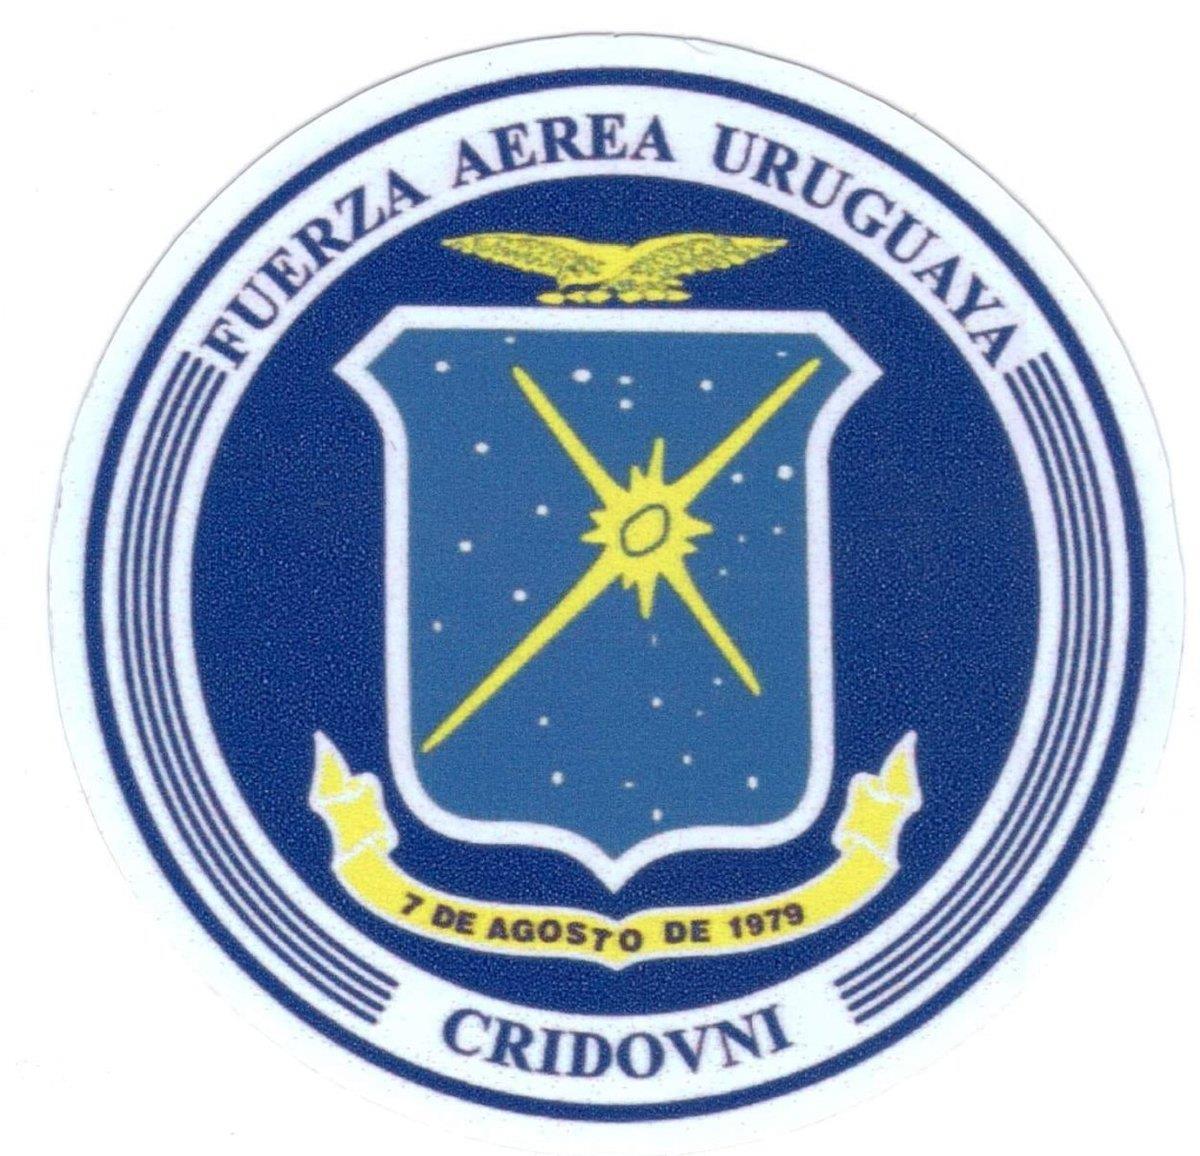 Comisión Receptora e Investigadora de Denuncias de Objetos Voladores No Identificados (CRIDOVNI)